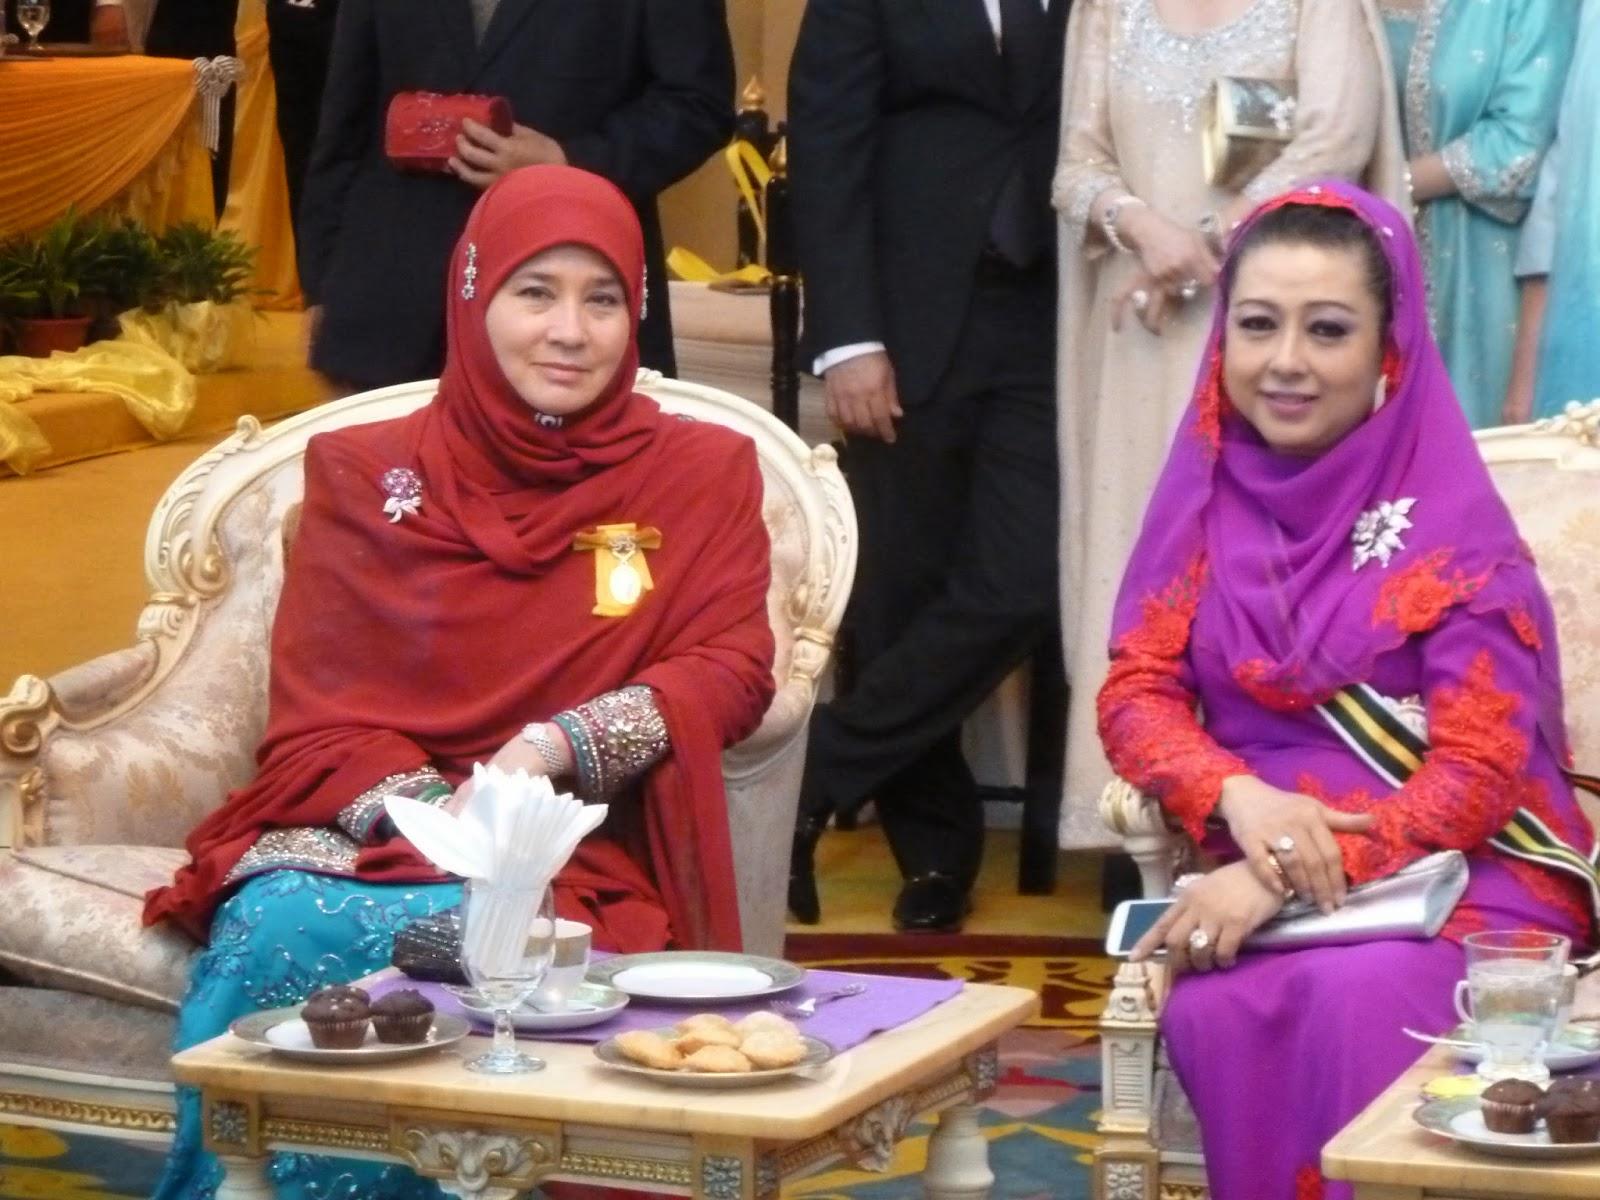 Tengku mahkota pahang wife sexual dysfunction